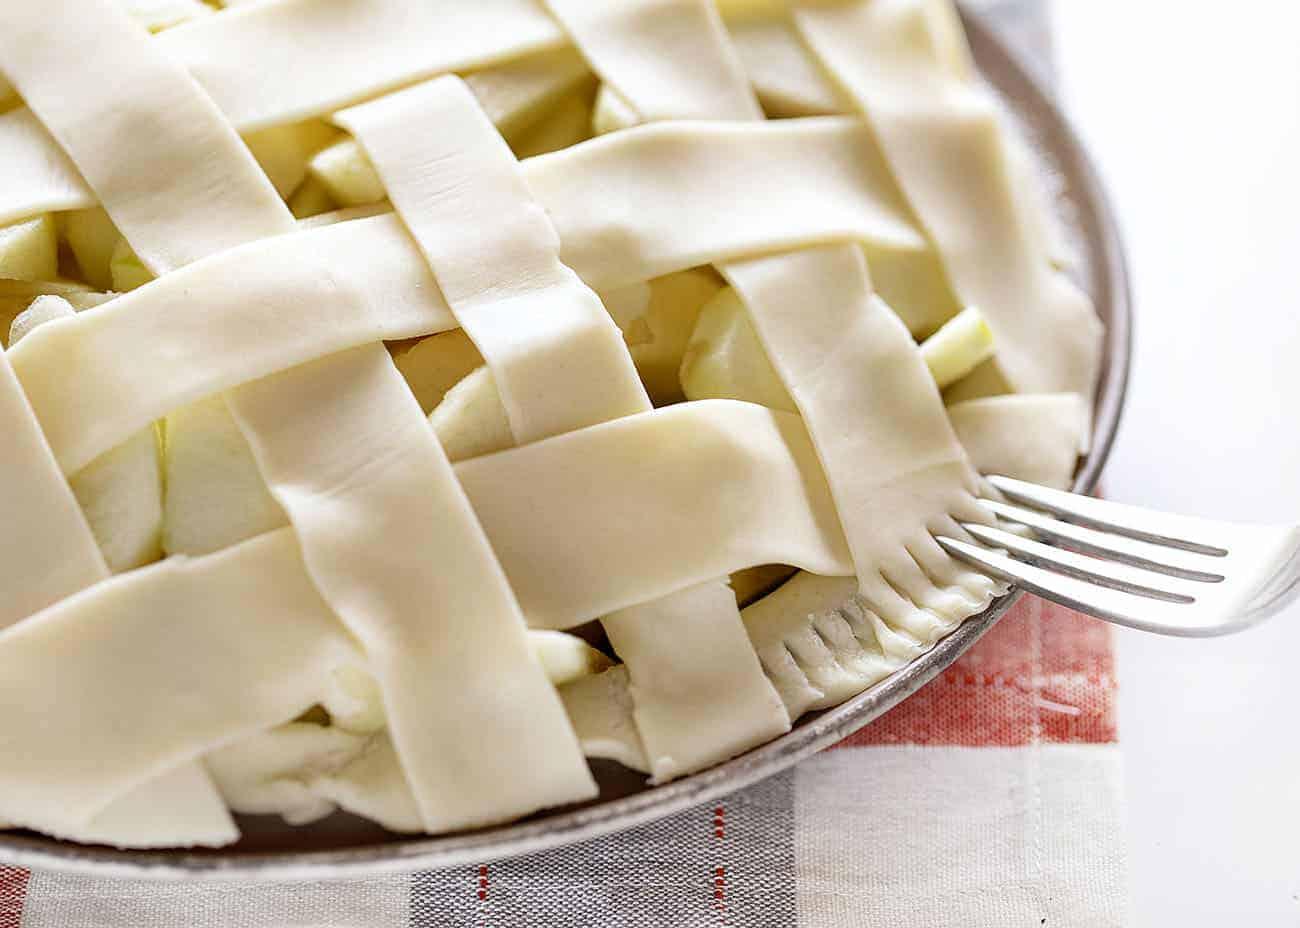 Crust Detail on an Apple Pie